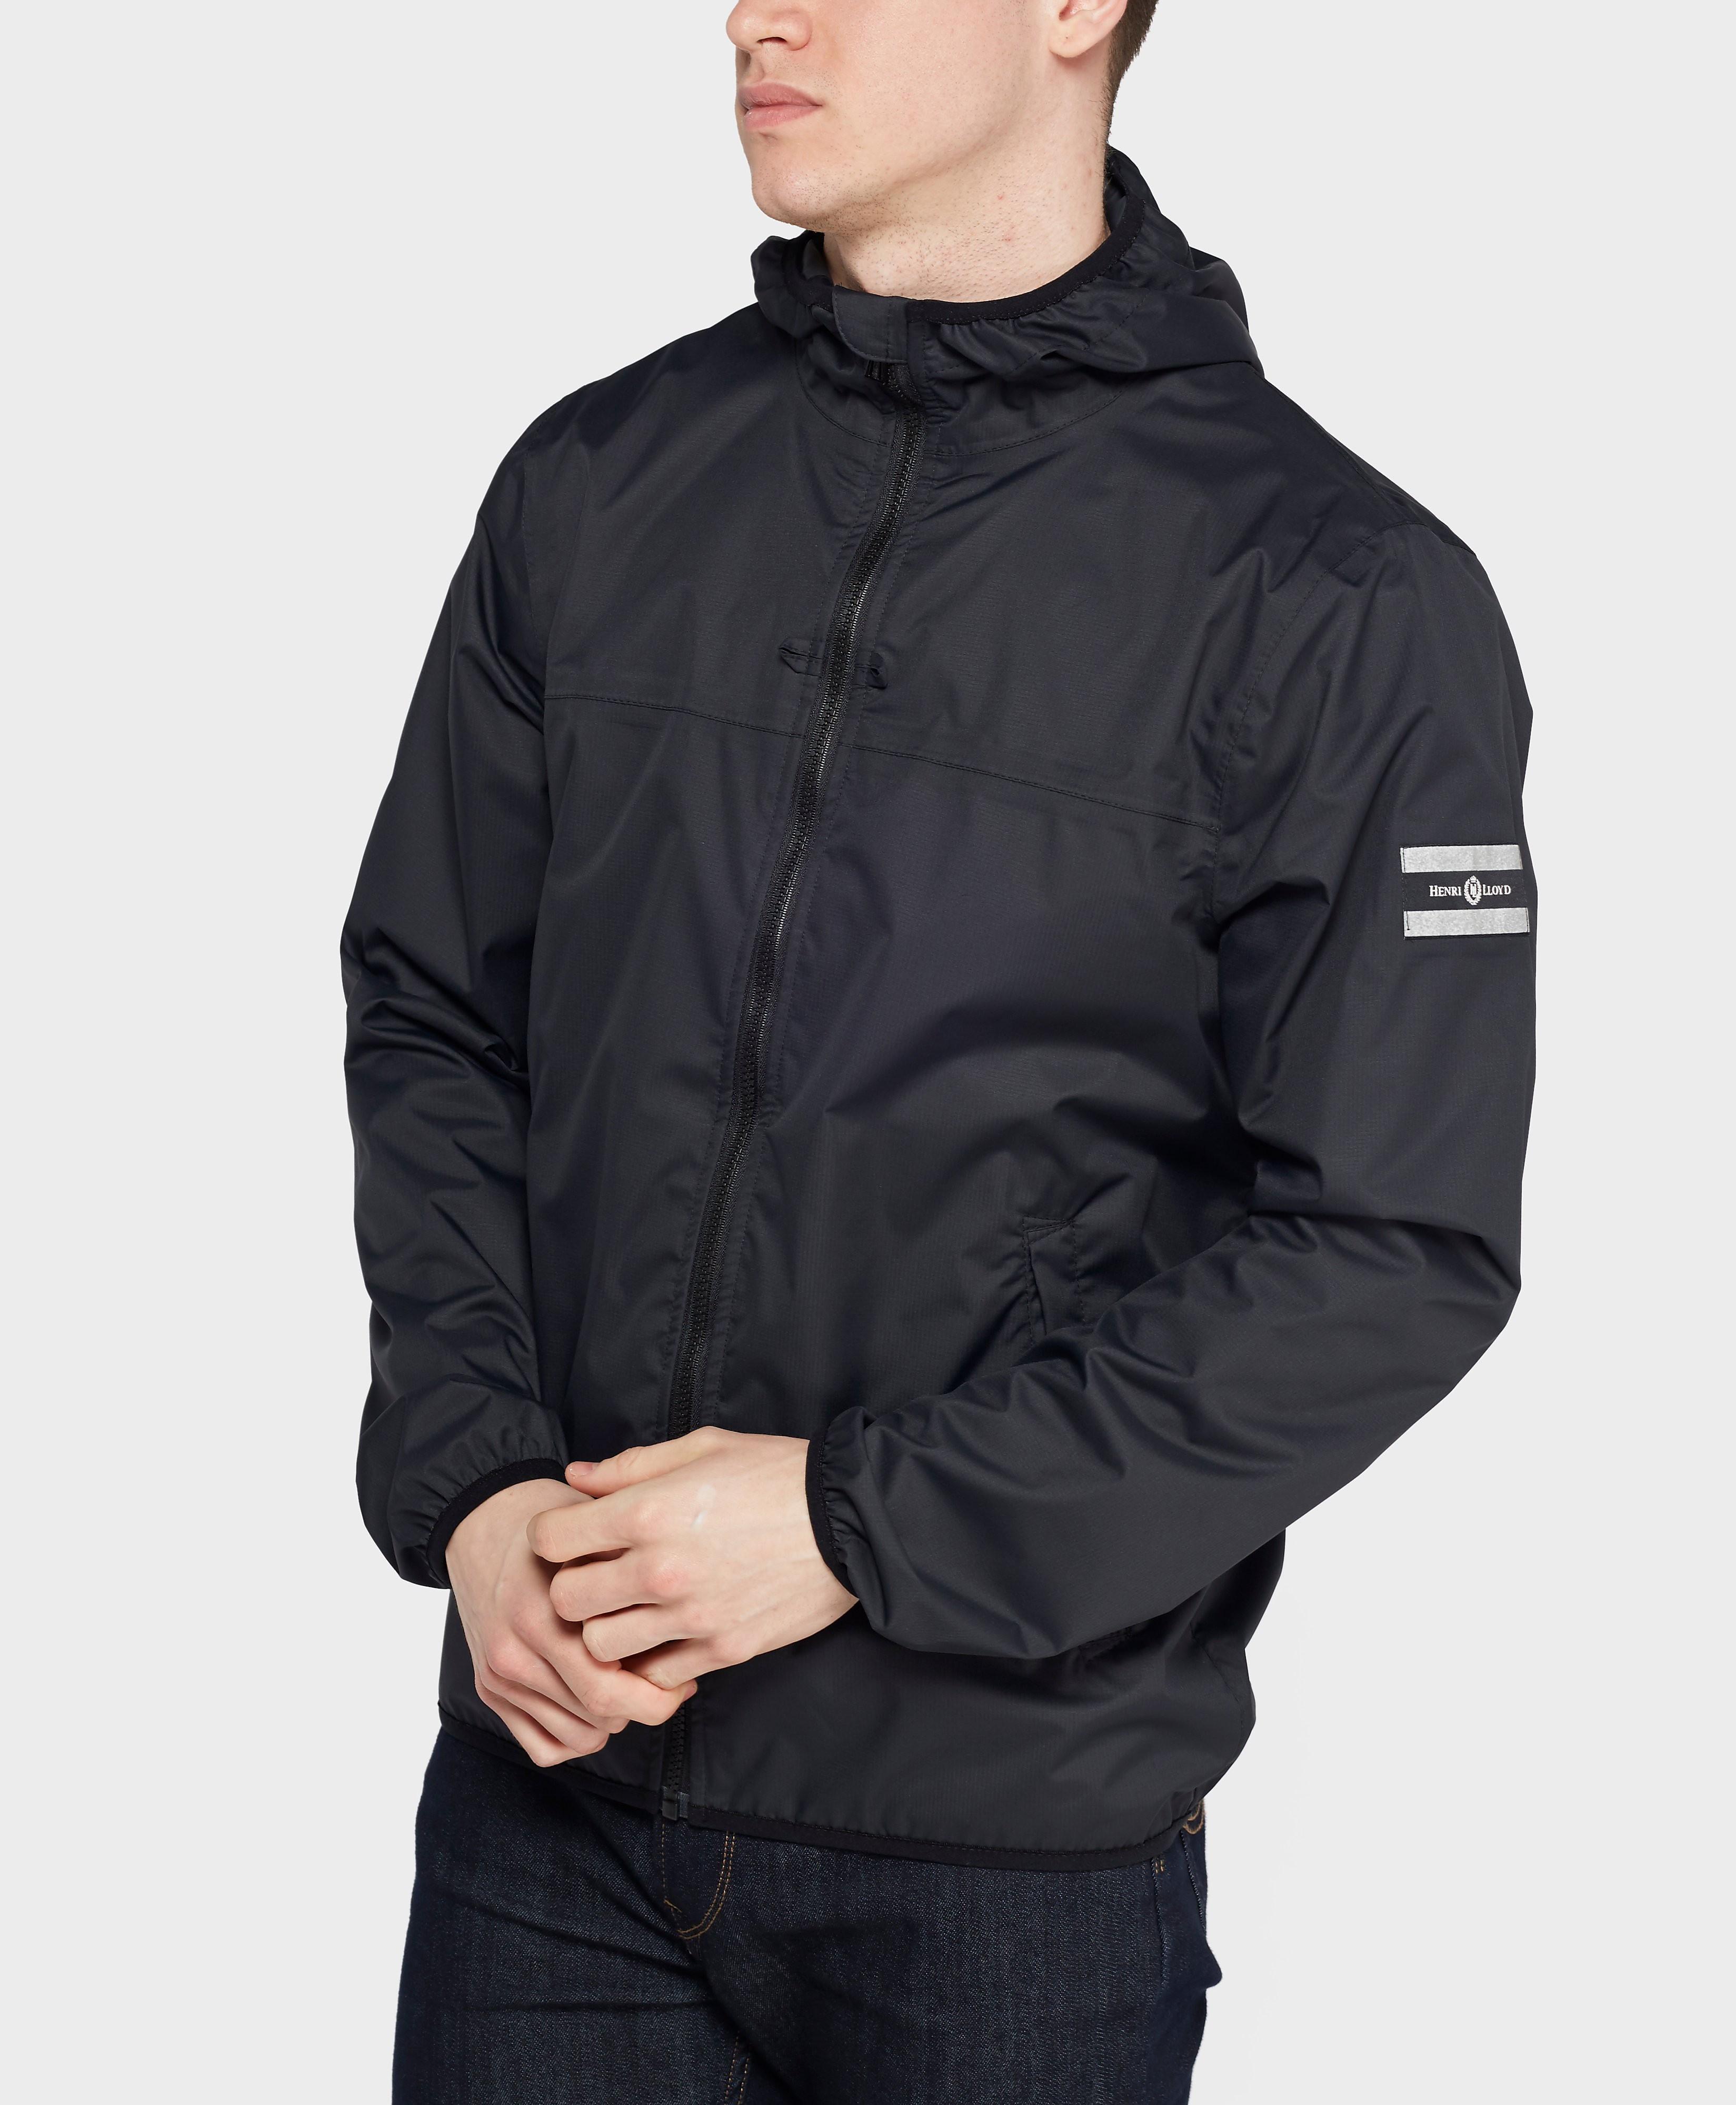 Henri Lloyd Satellite Lightweight Jacket